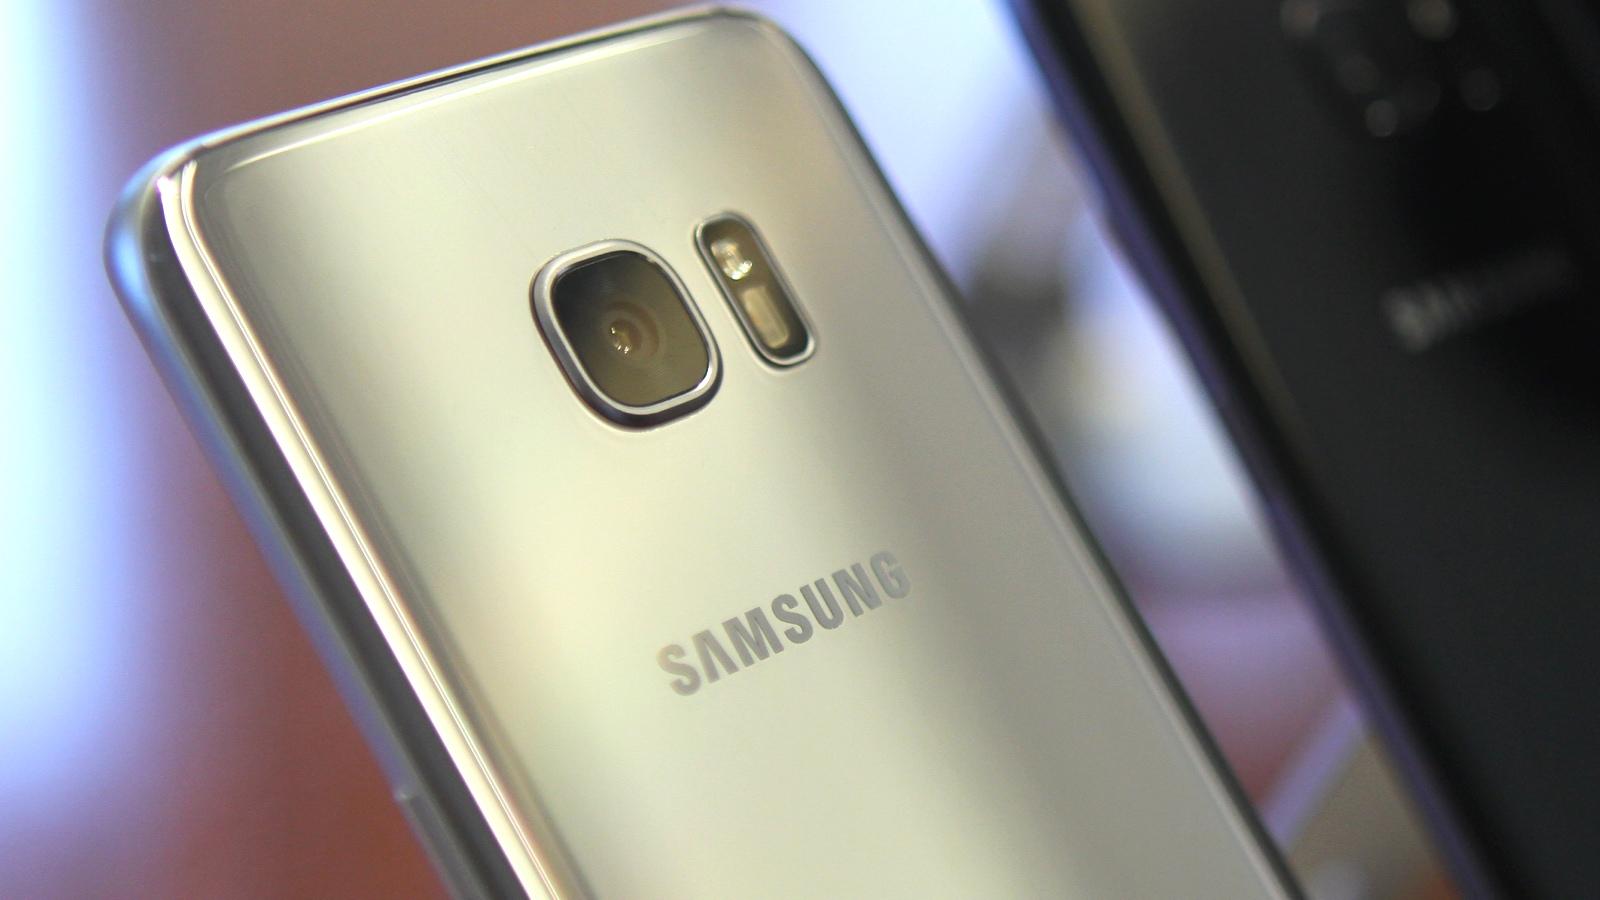 Samsung Galaxy S7 Edge побил iPhone 6s Plus в фотобитве